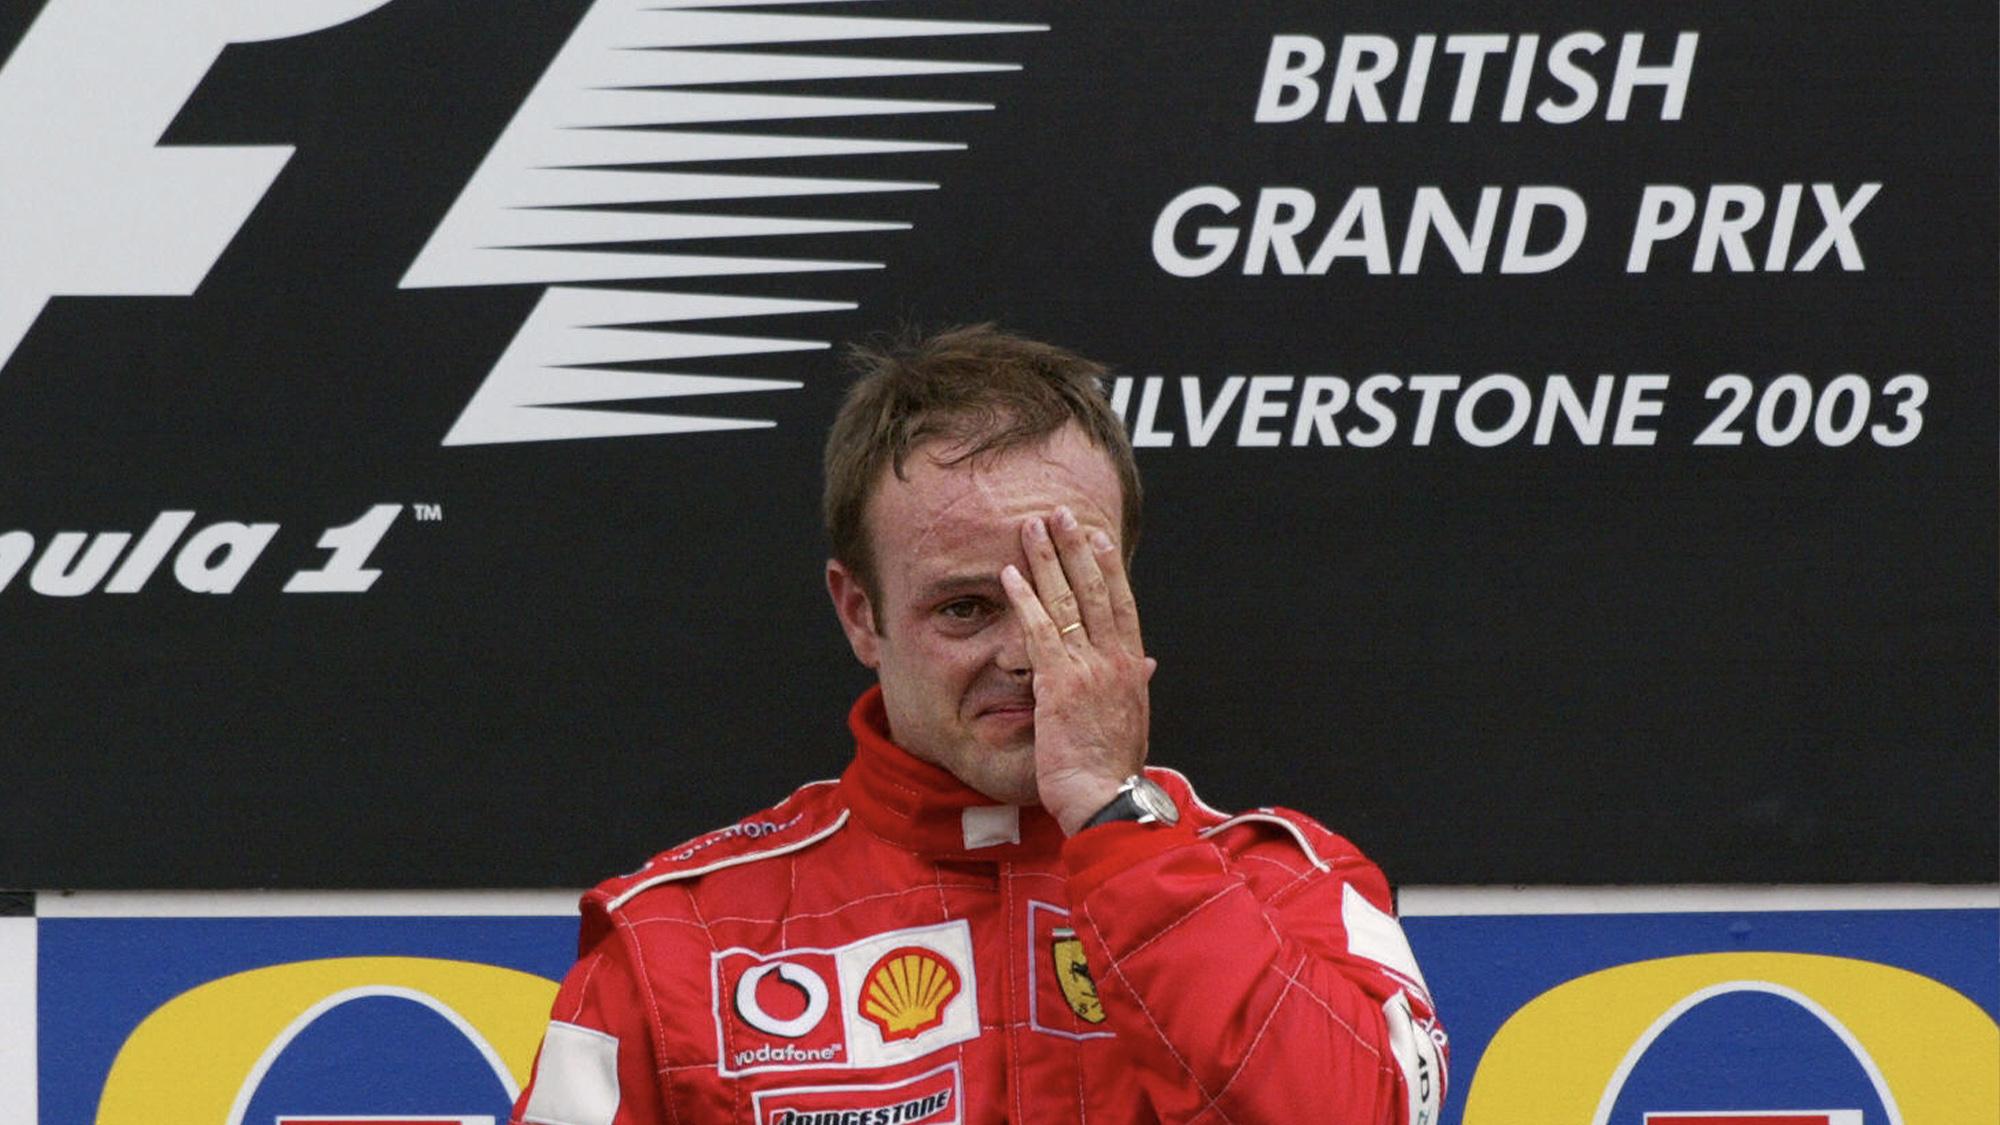 A tearful Rubens Barrichello celebrates victory in the 2003 British Grand Prix at Silverstone